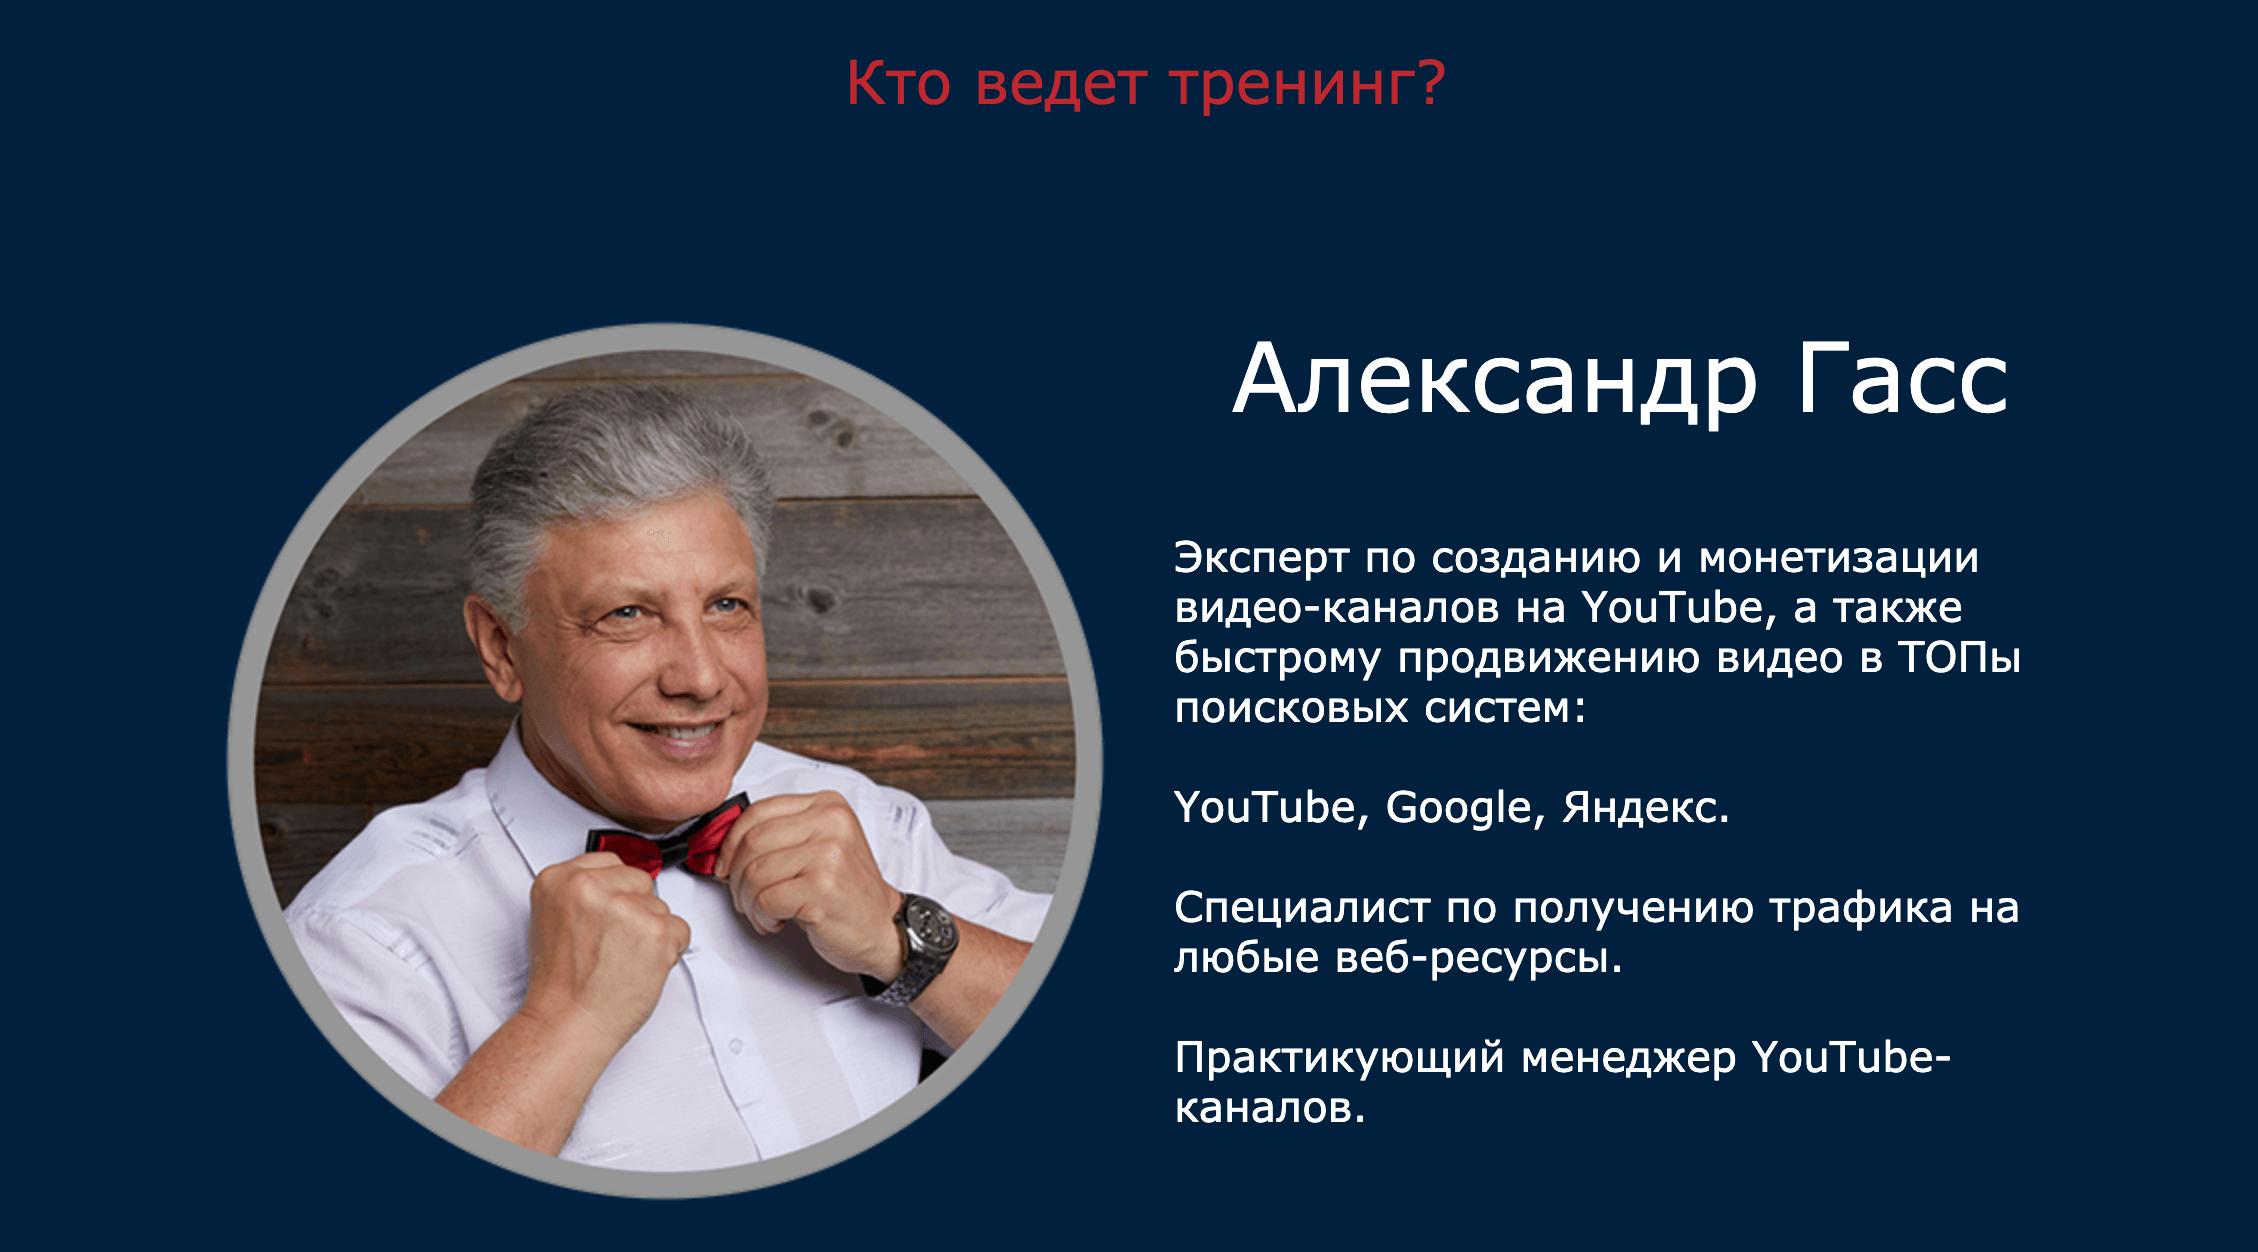 Александр Гасс